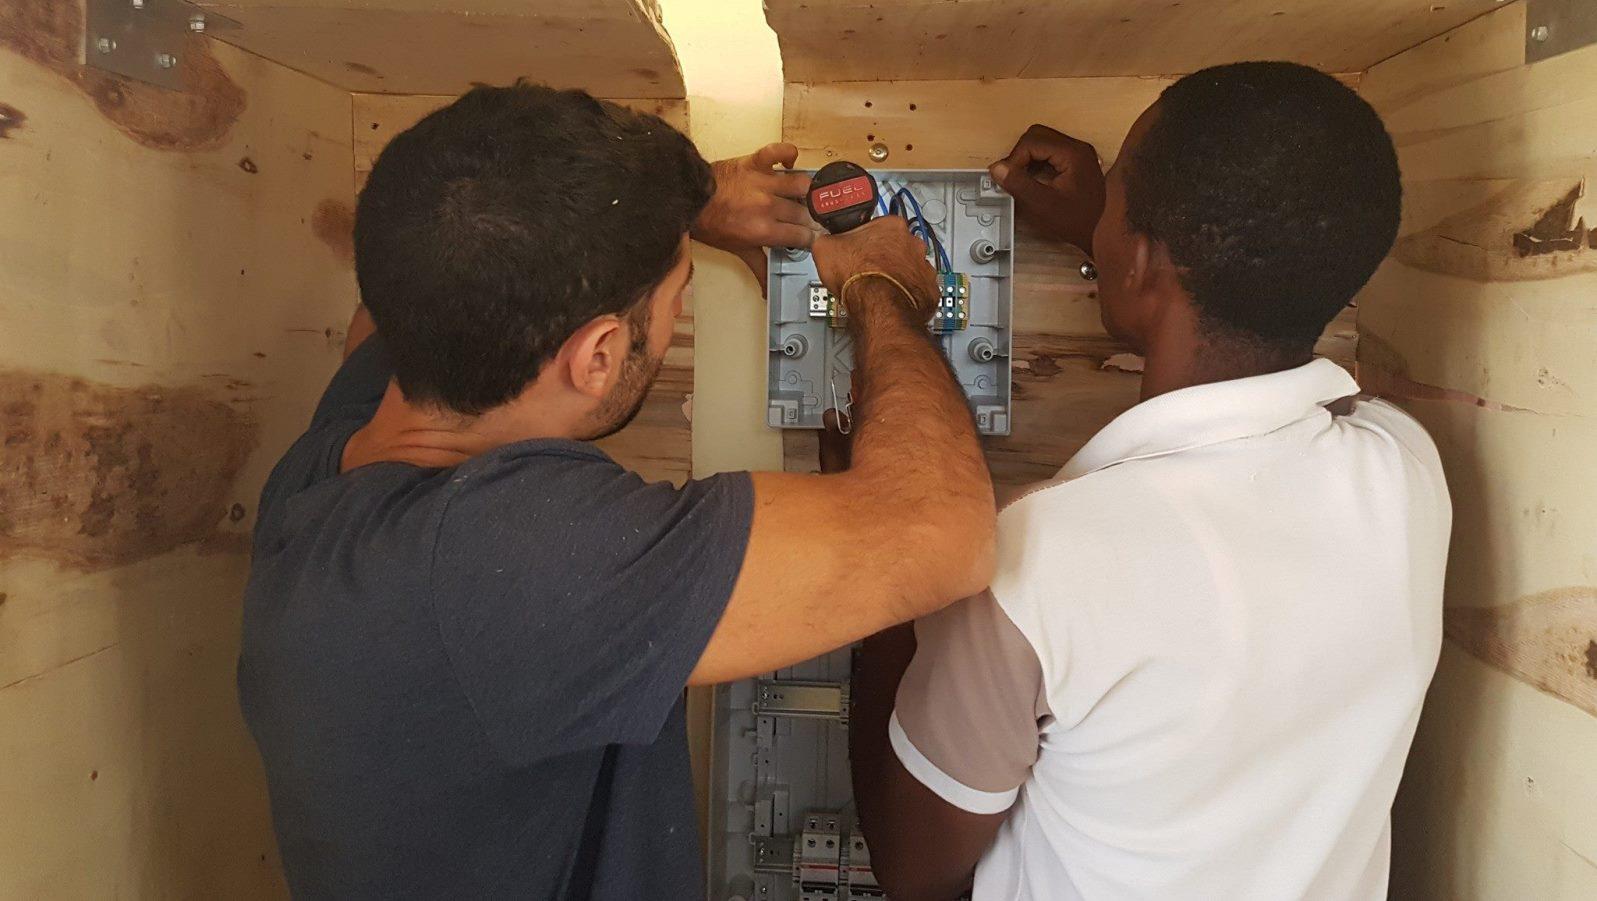 EwB TAU member Raz Cohen working with a Minjingu resident to install the solar generator. Photo via Facebook